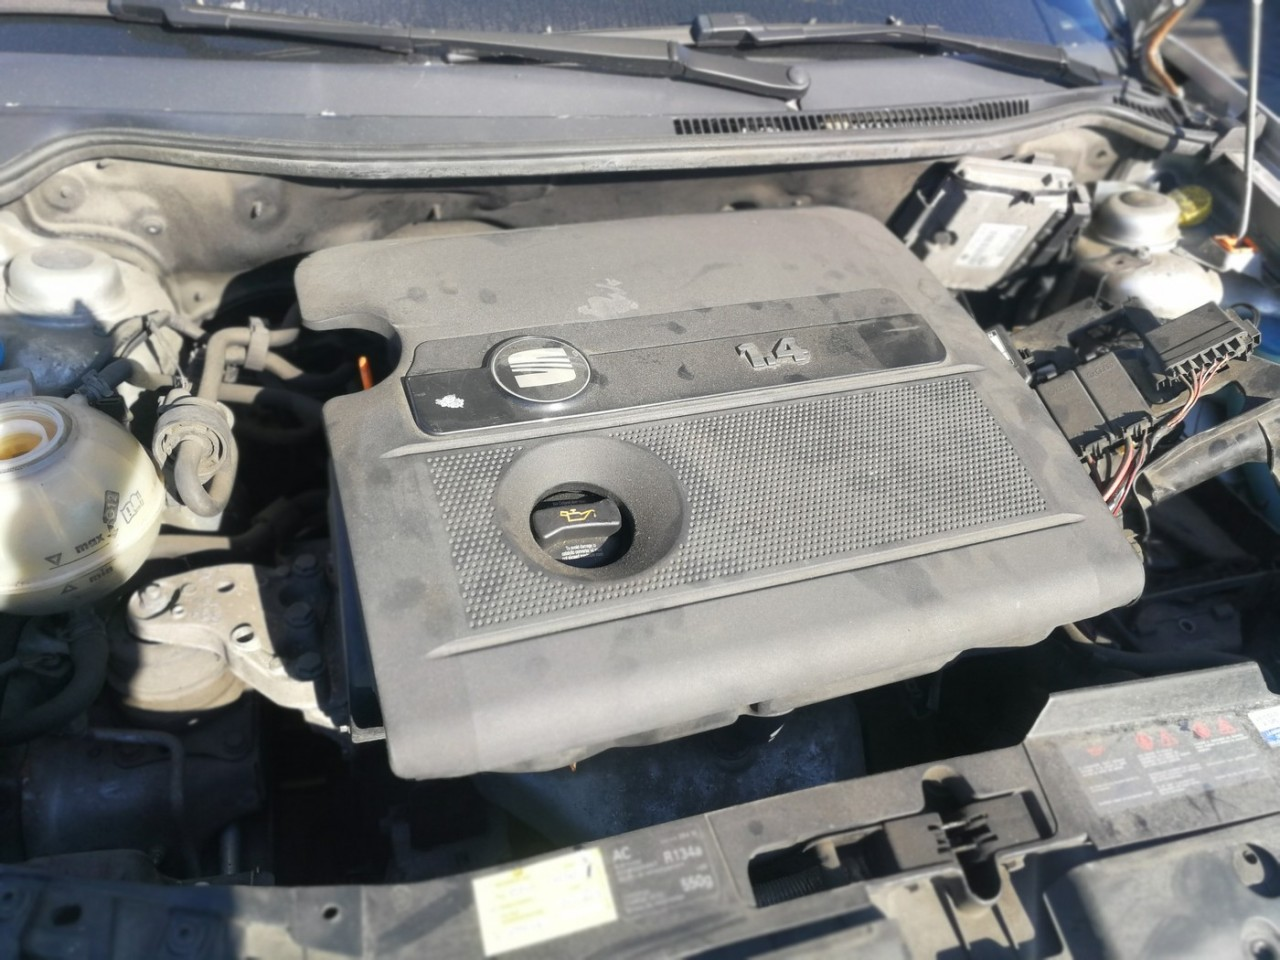 Dezmembrez Seat Ibiza 1.4 16v an 2007 tip motor BKY